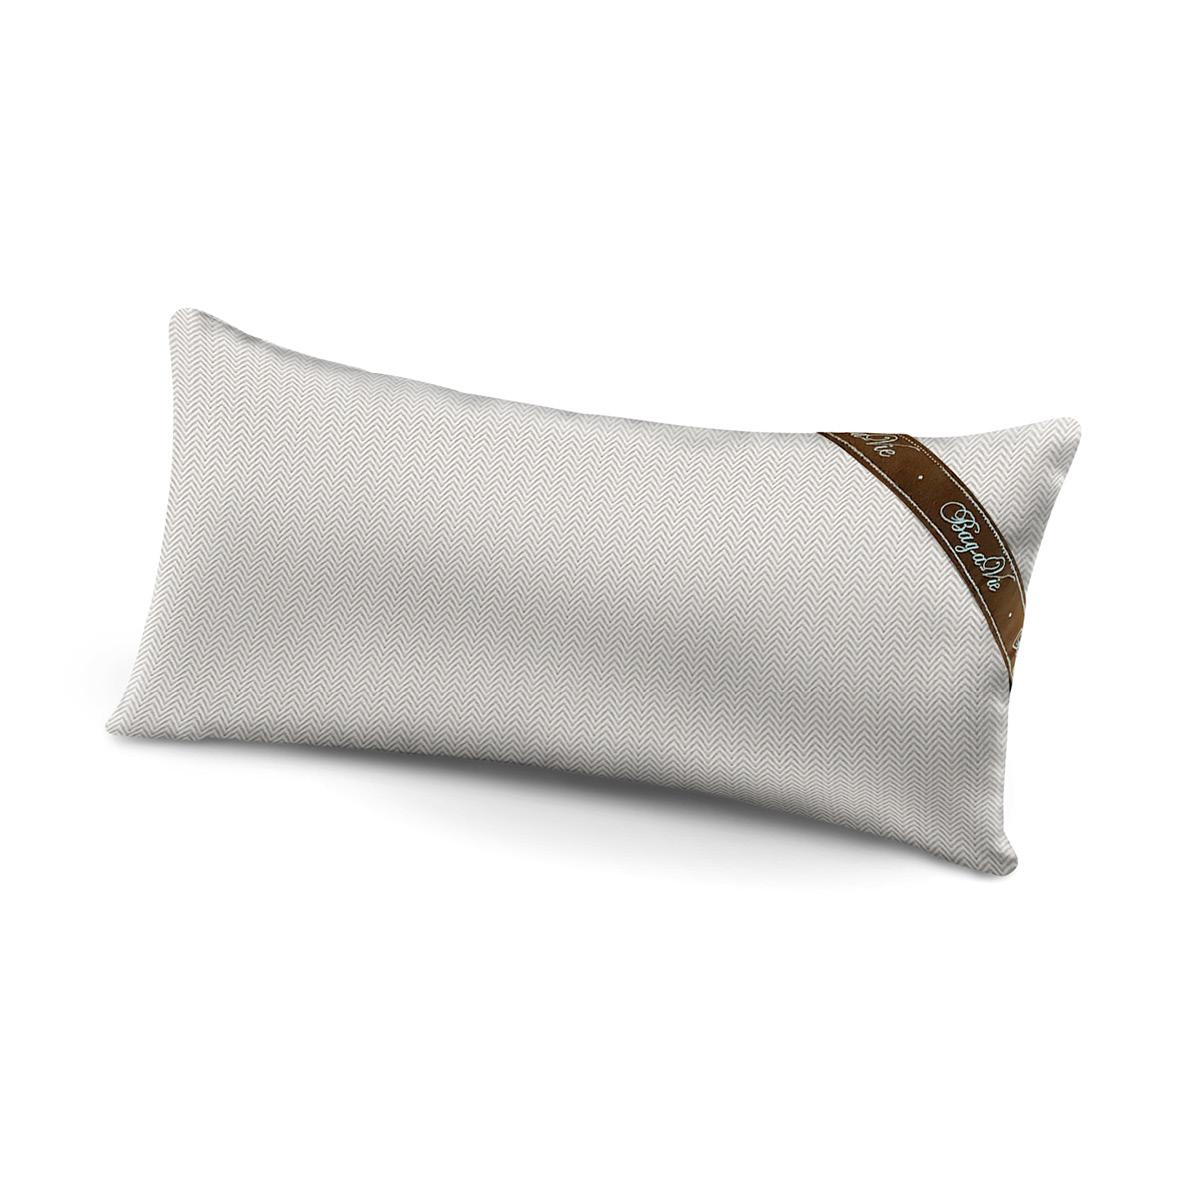 Classic Petite Handbag Storage Pillow Shaper